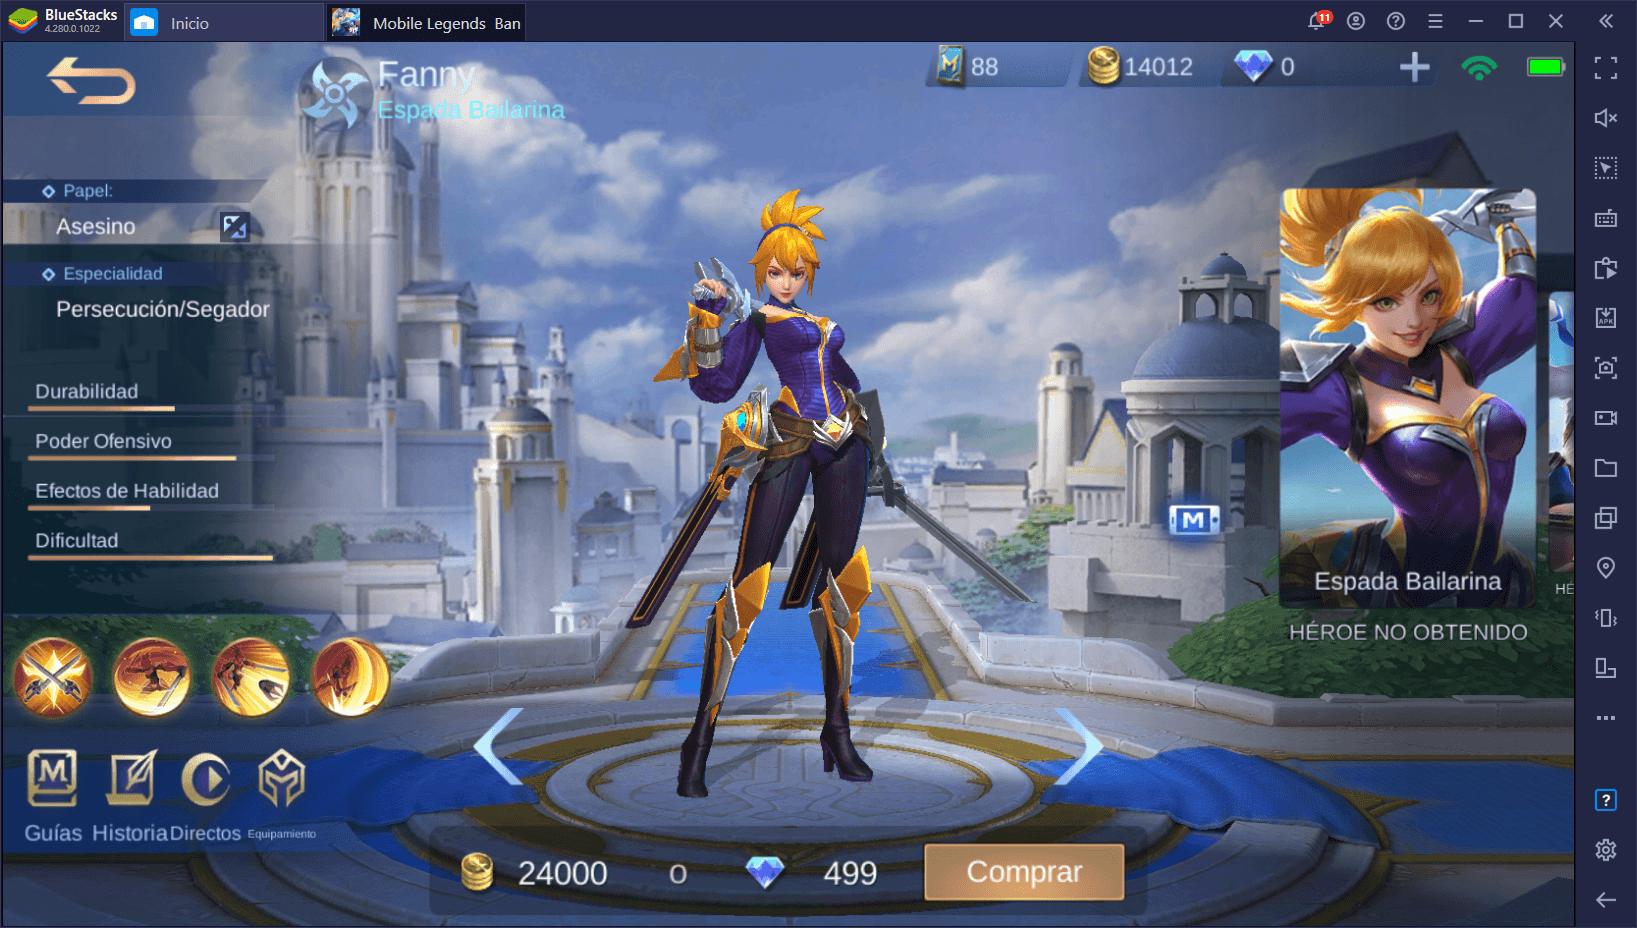 Cómo Dominar en la Jungla en Mobile Legends: Bang Bang